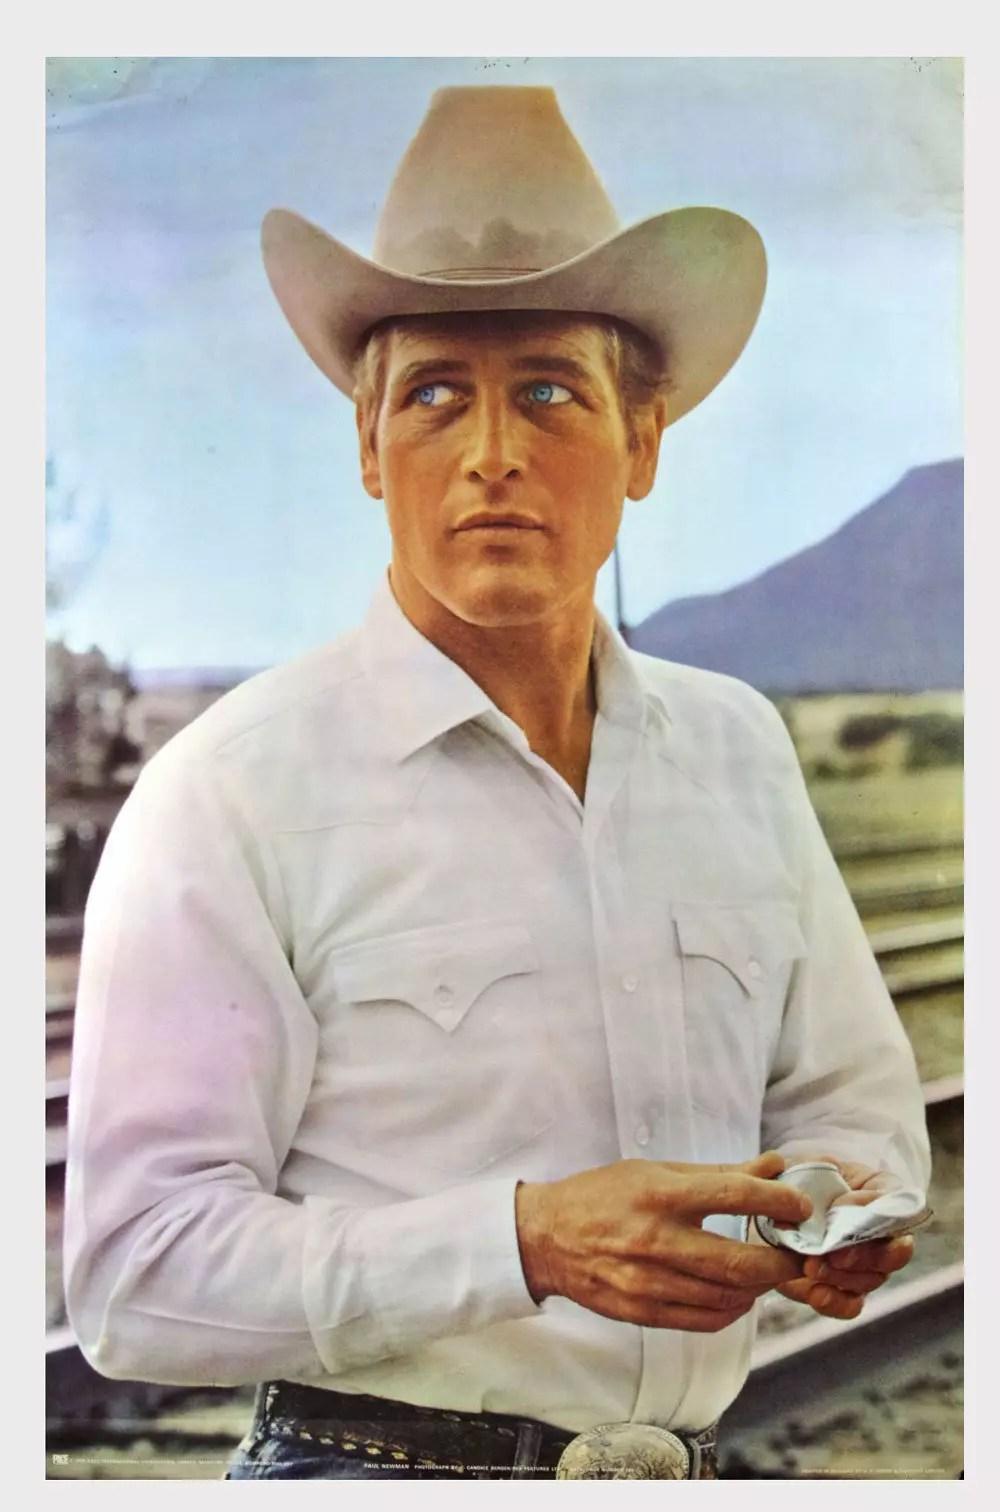 Paul Newman Poster 1972 Photo Candice Bergen 25 x 37 Condition Fine